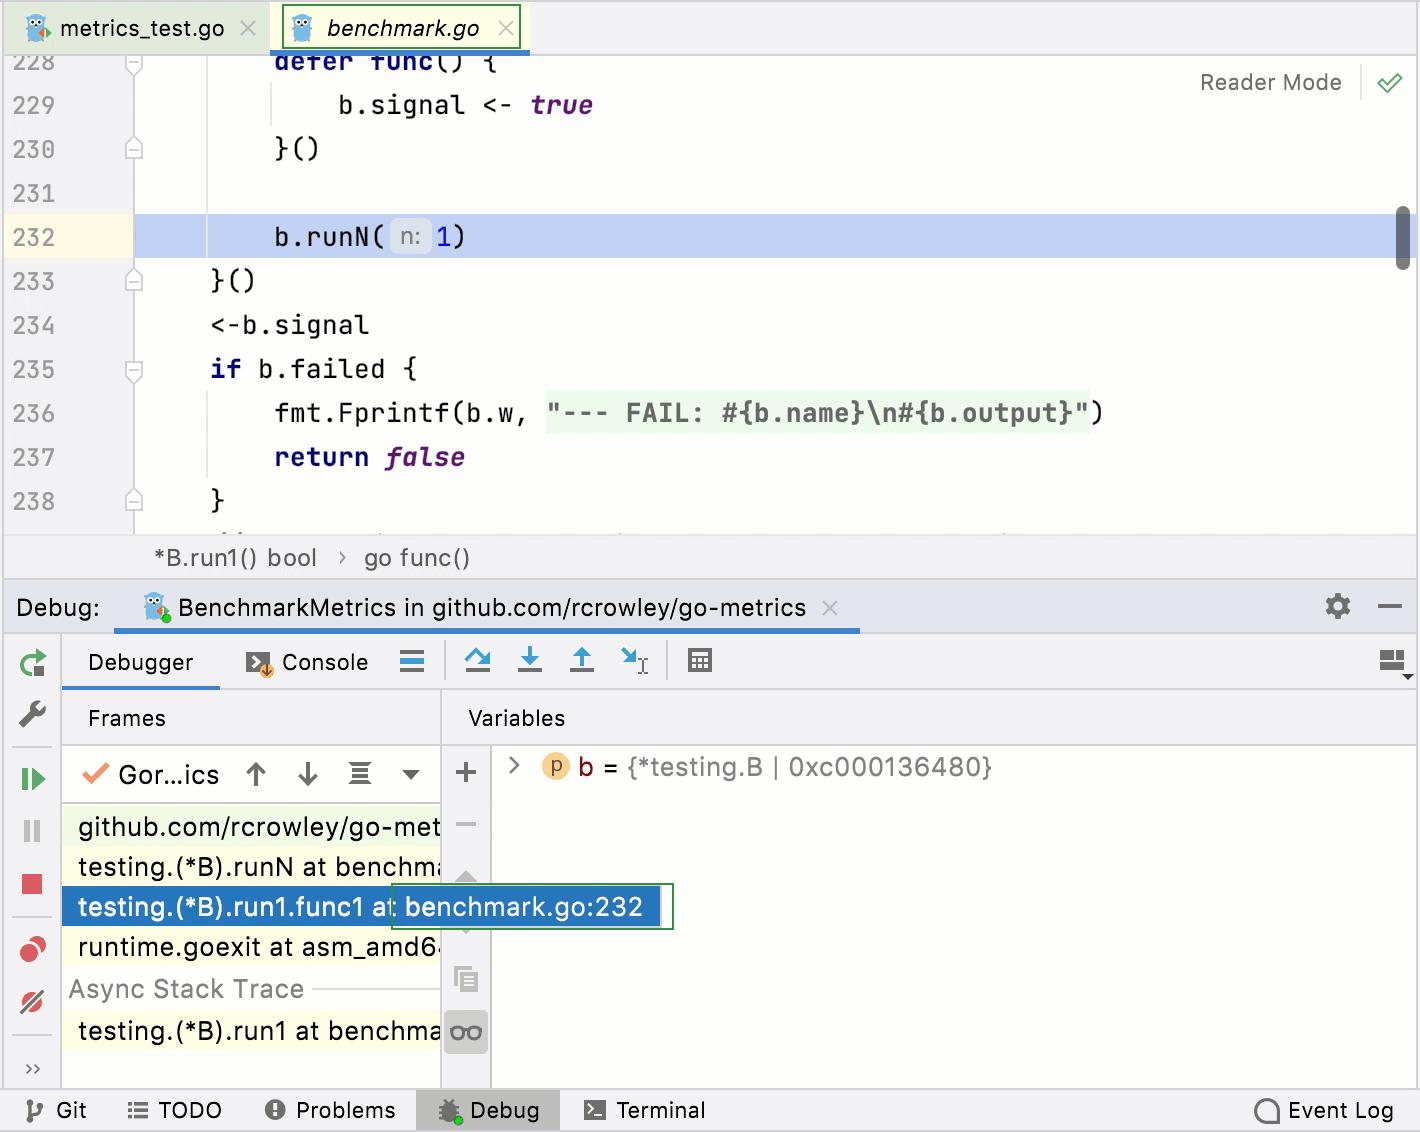 Debugger: the preview tab